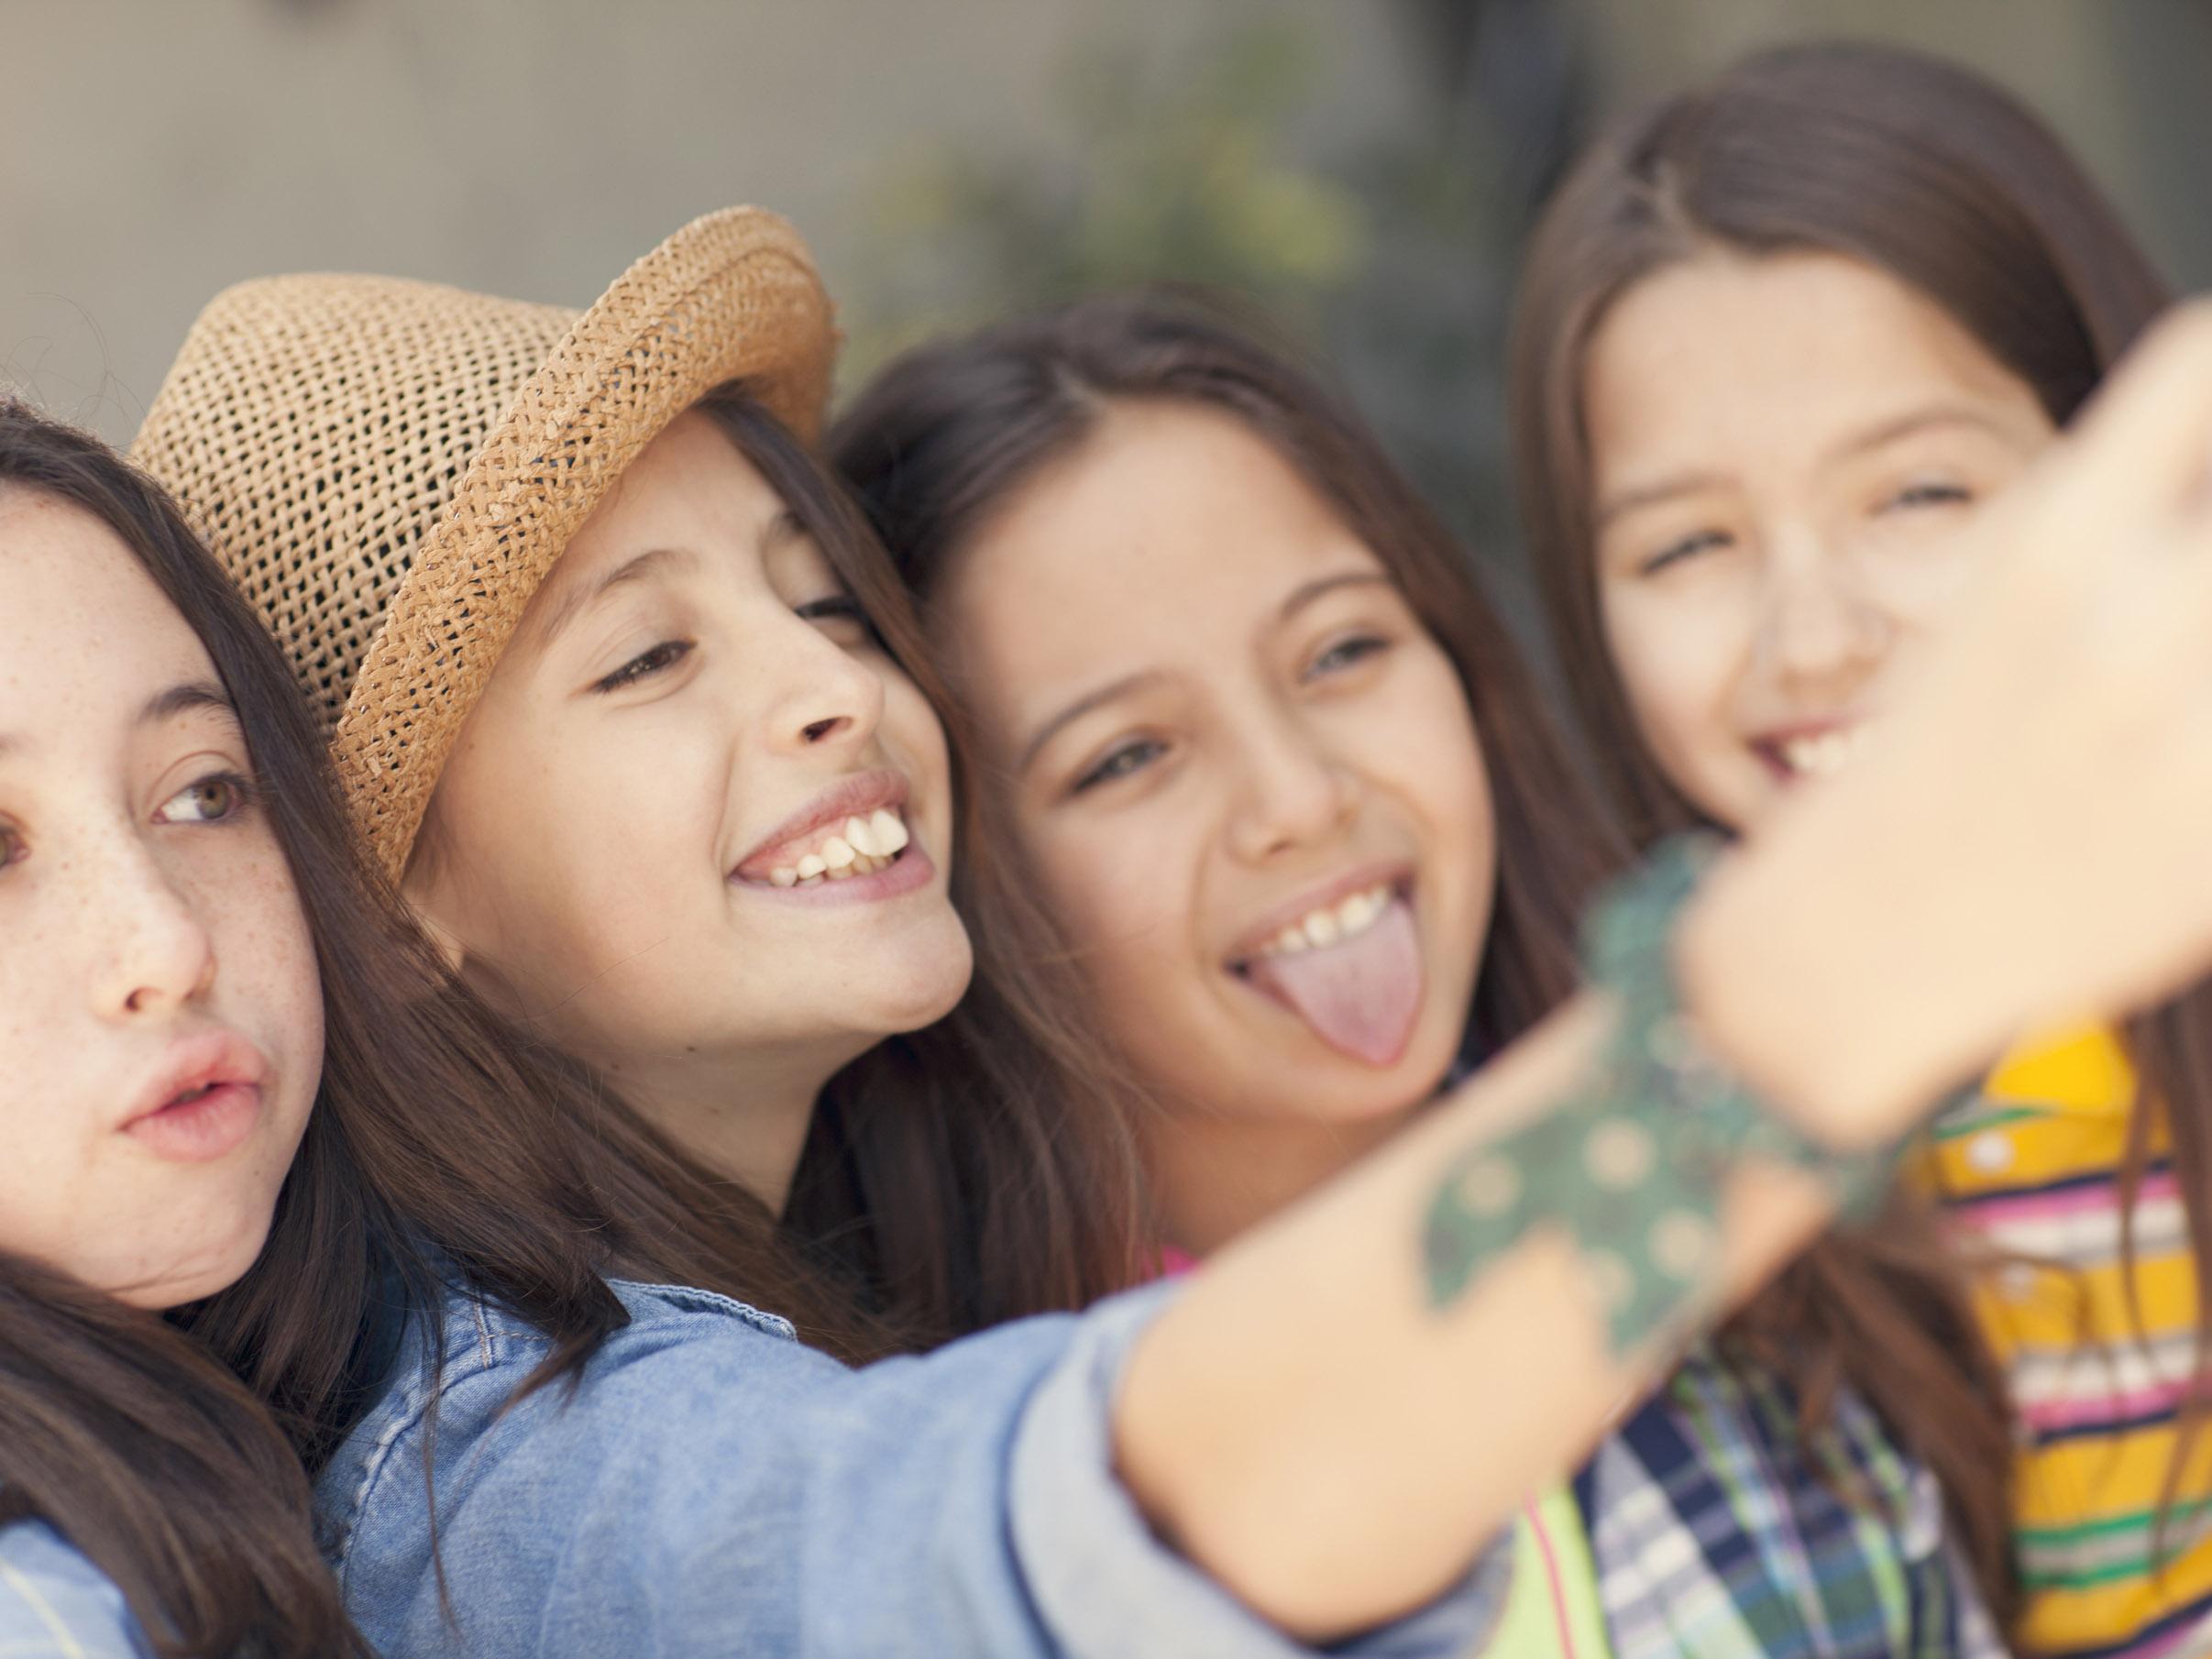 Building Self Esteem In Middle School